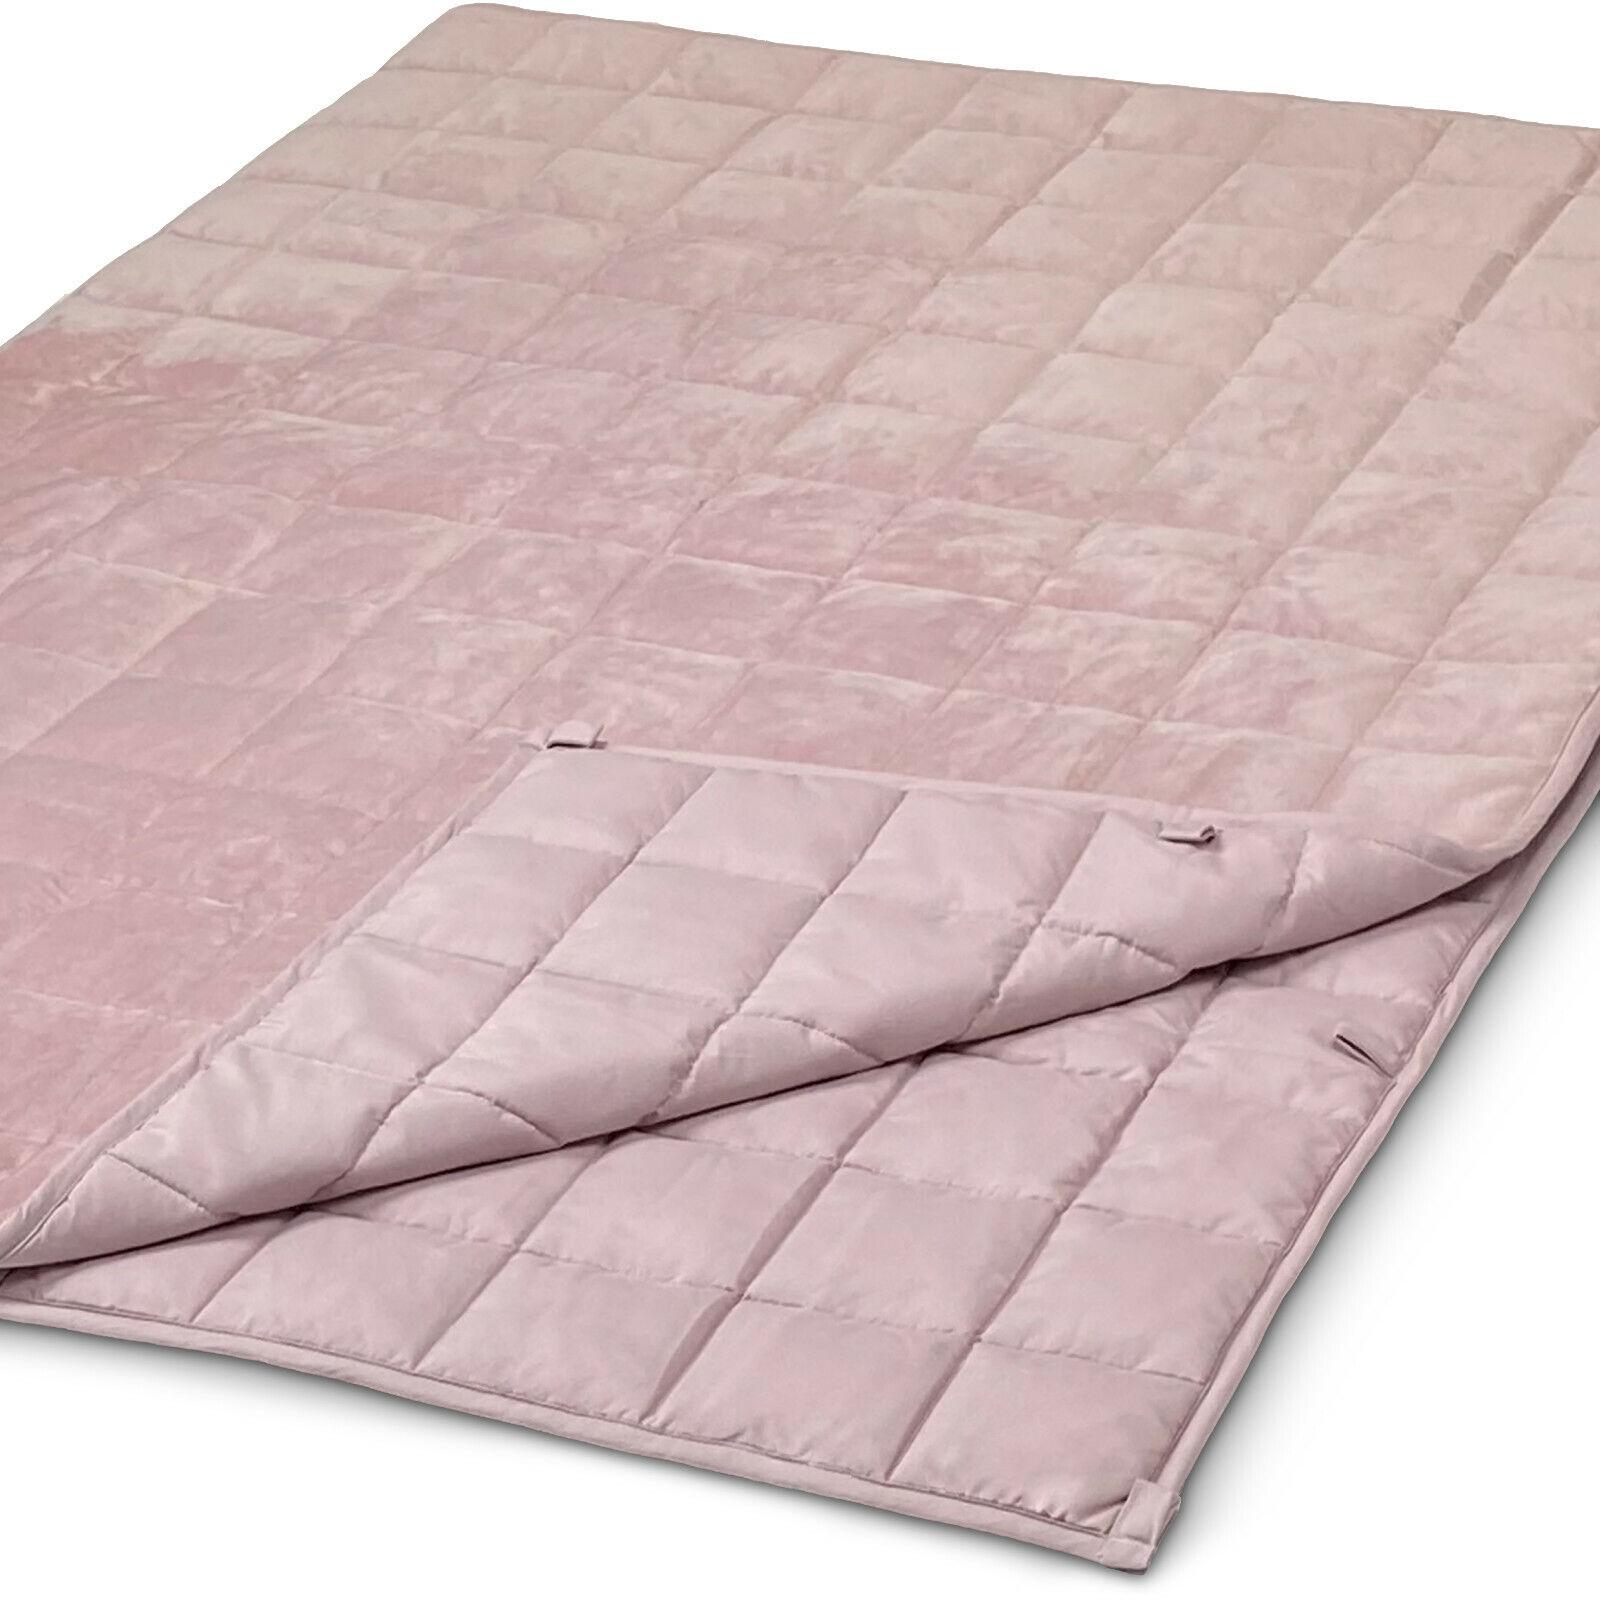 WAVEBEAD Rosa Gewichtsdecke 6kg 135x200 aus OEKO-TEX® STANDARD 100 Material